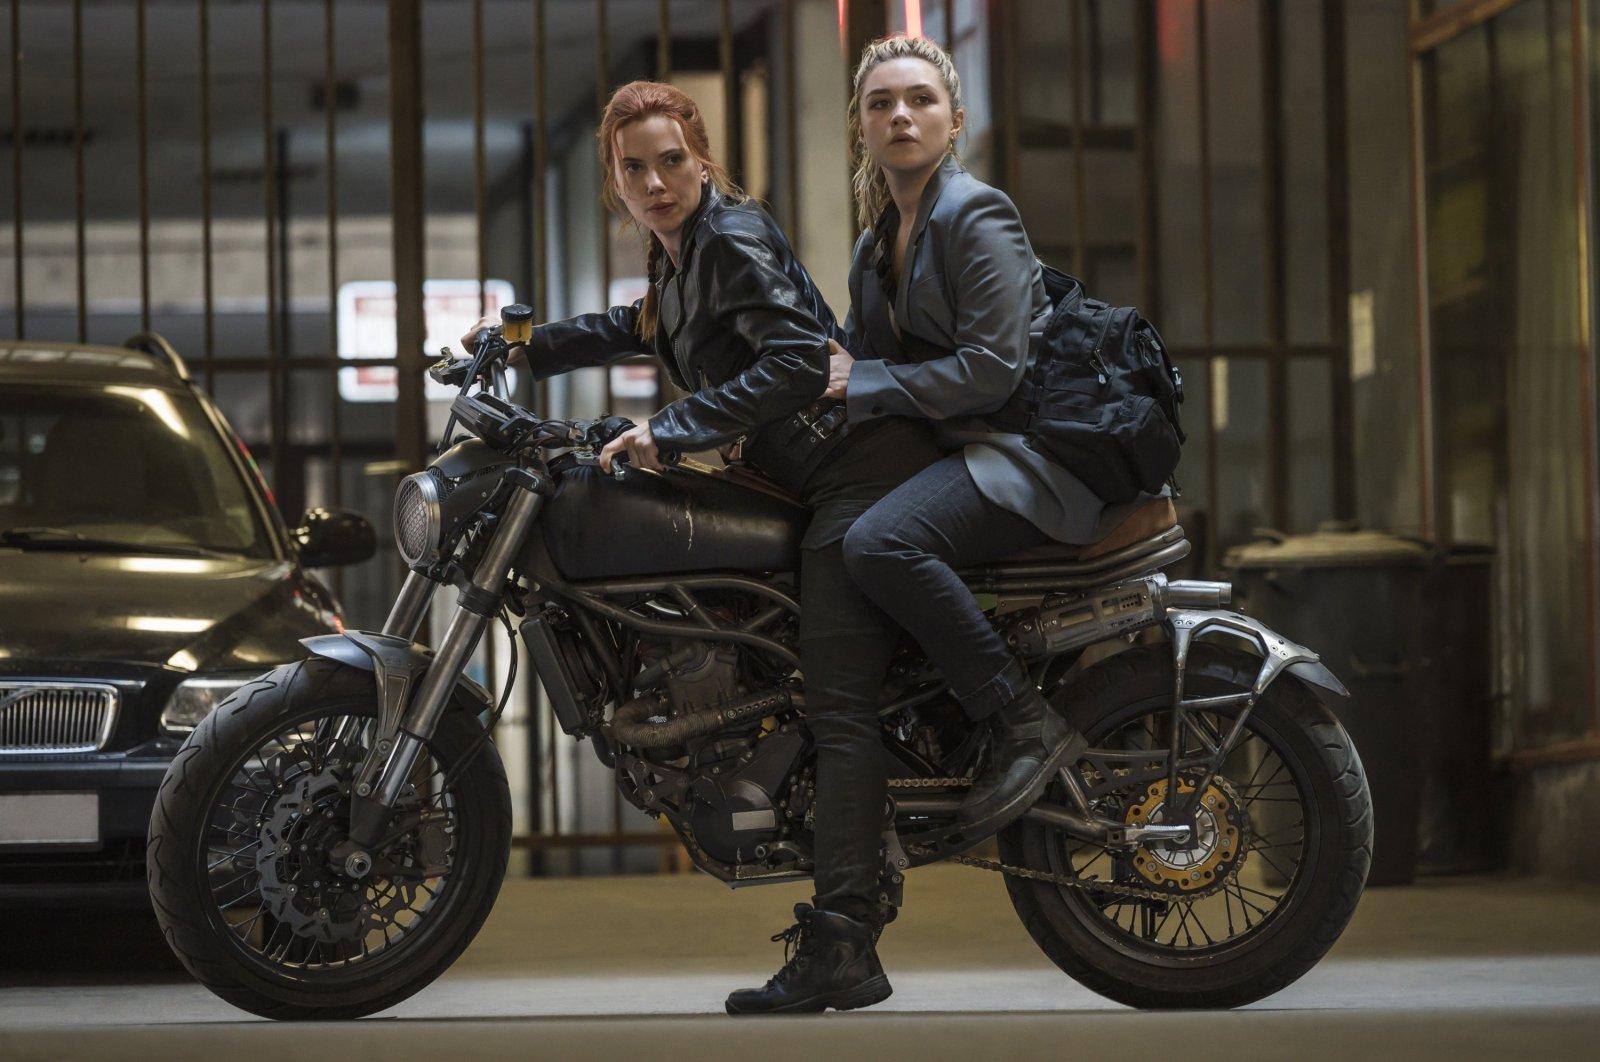 "Scarlett Johansson (L) rides a motorcycle with Florence Pugh in a scene from Marvel superhero film ""Black Widow."" (Disney via AP)"